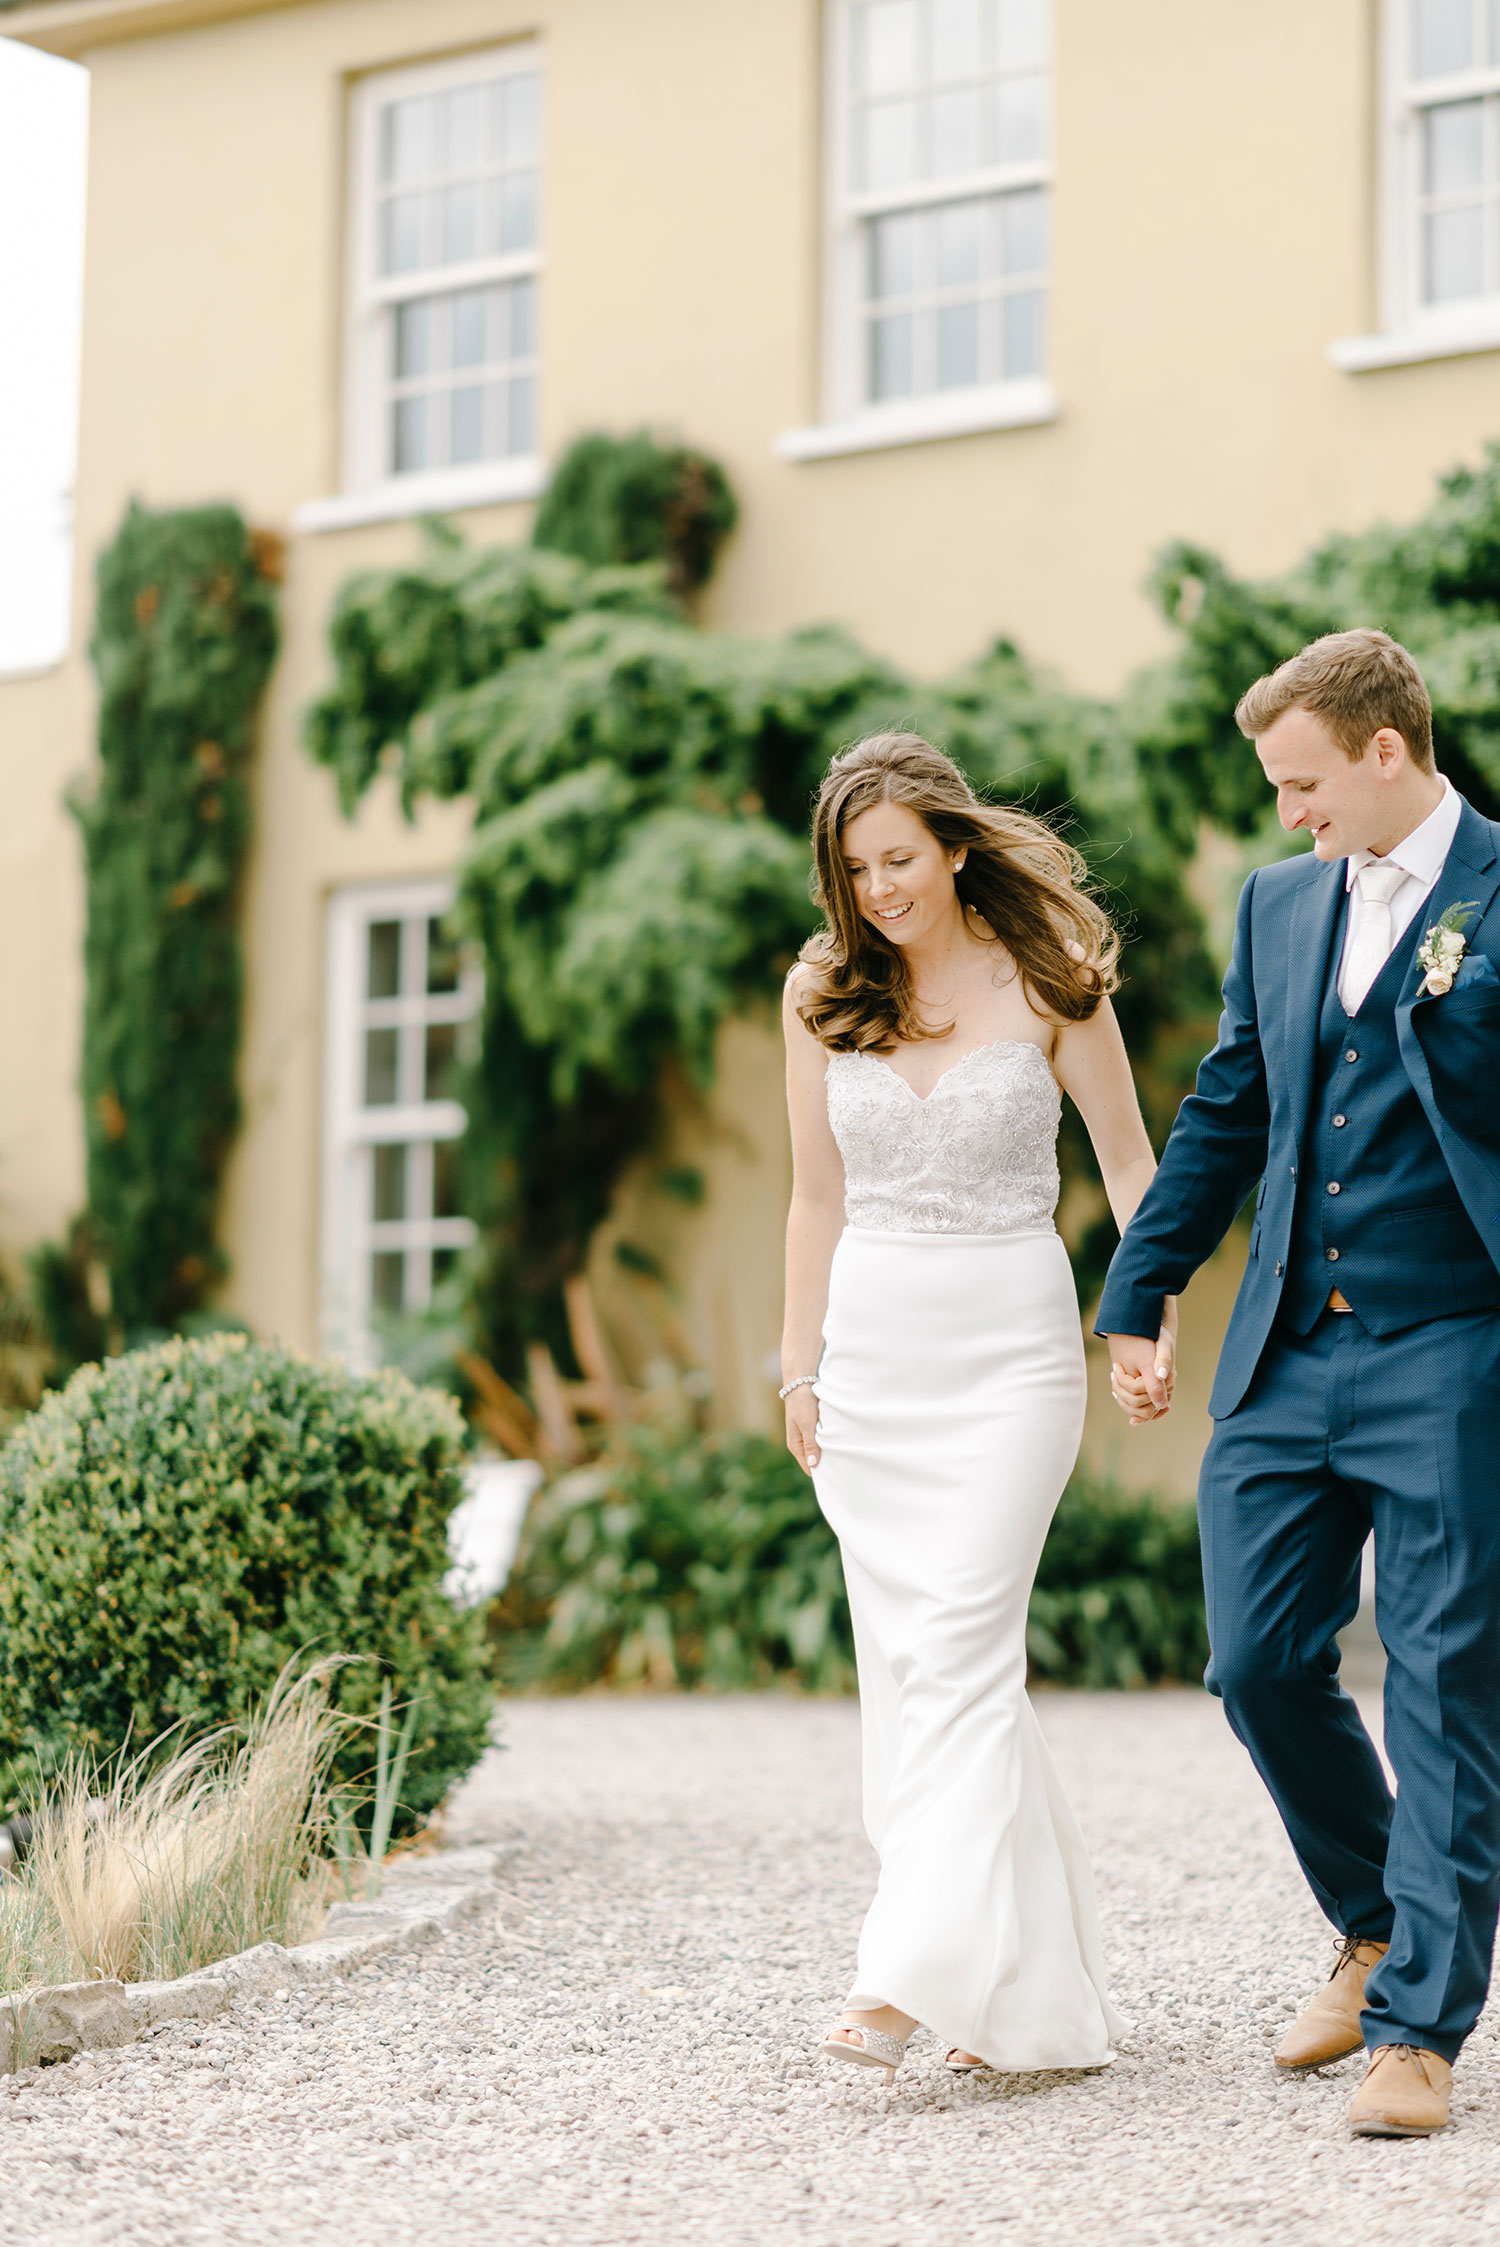 destination-wedding-photographer-ballinacurra-house-wedding-20180711_0087.jpg